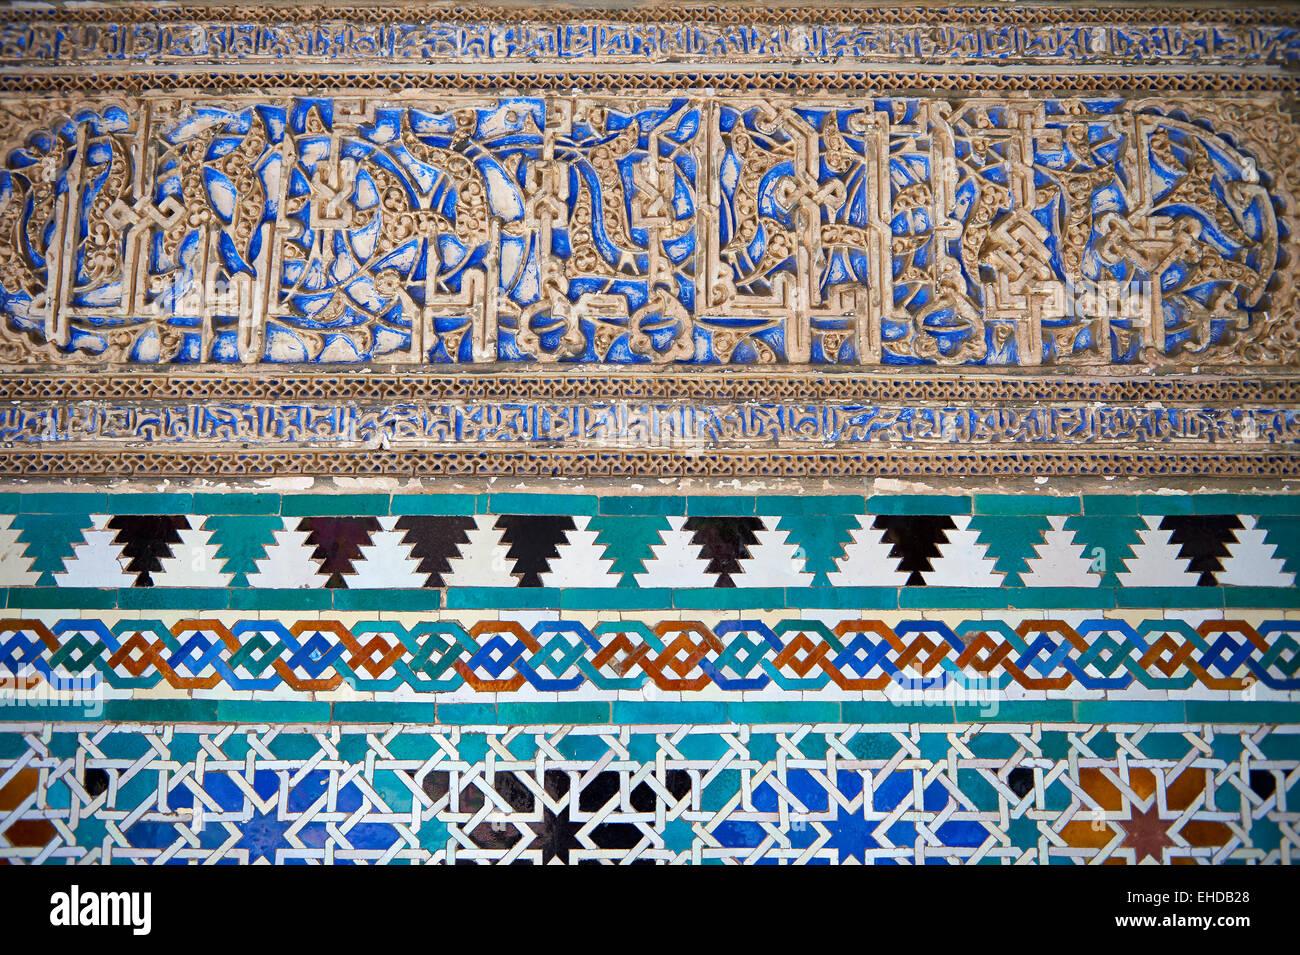 Detail of the Arabesque Mudéjar style plaster work, Patio de las Doncellas (Courtyard of the Maidens) Alcazar - Stock Image